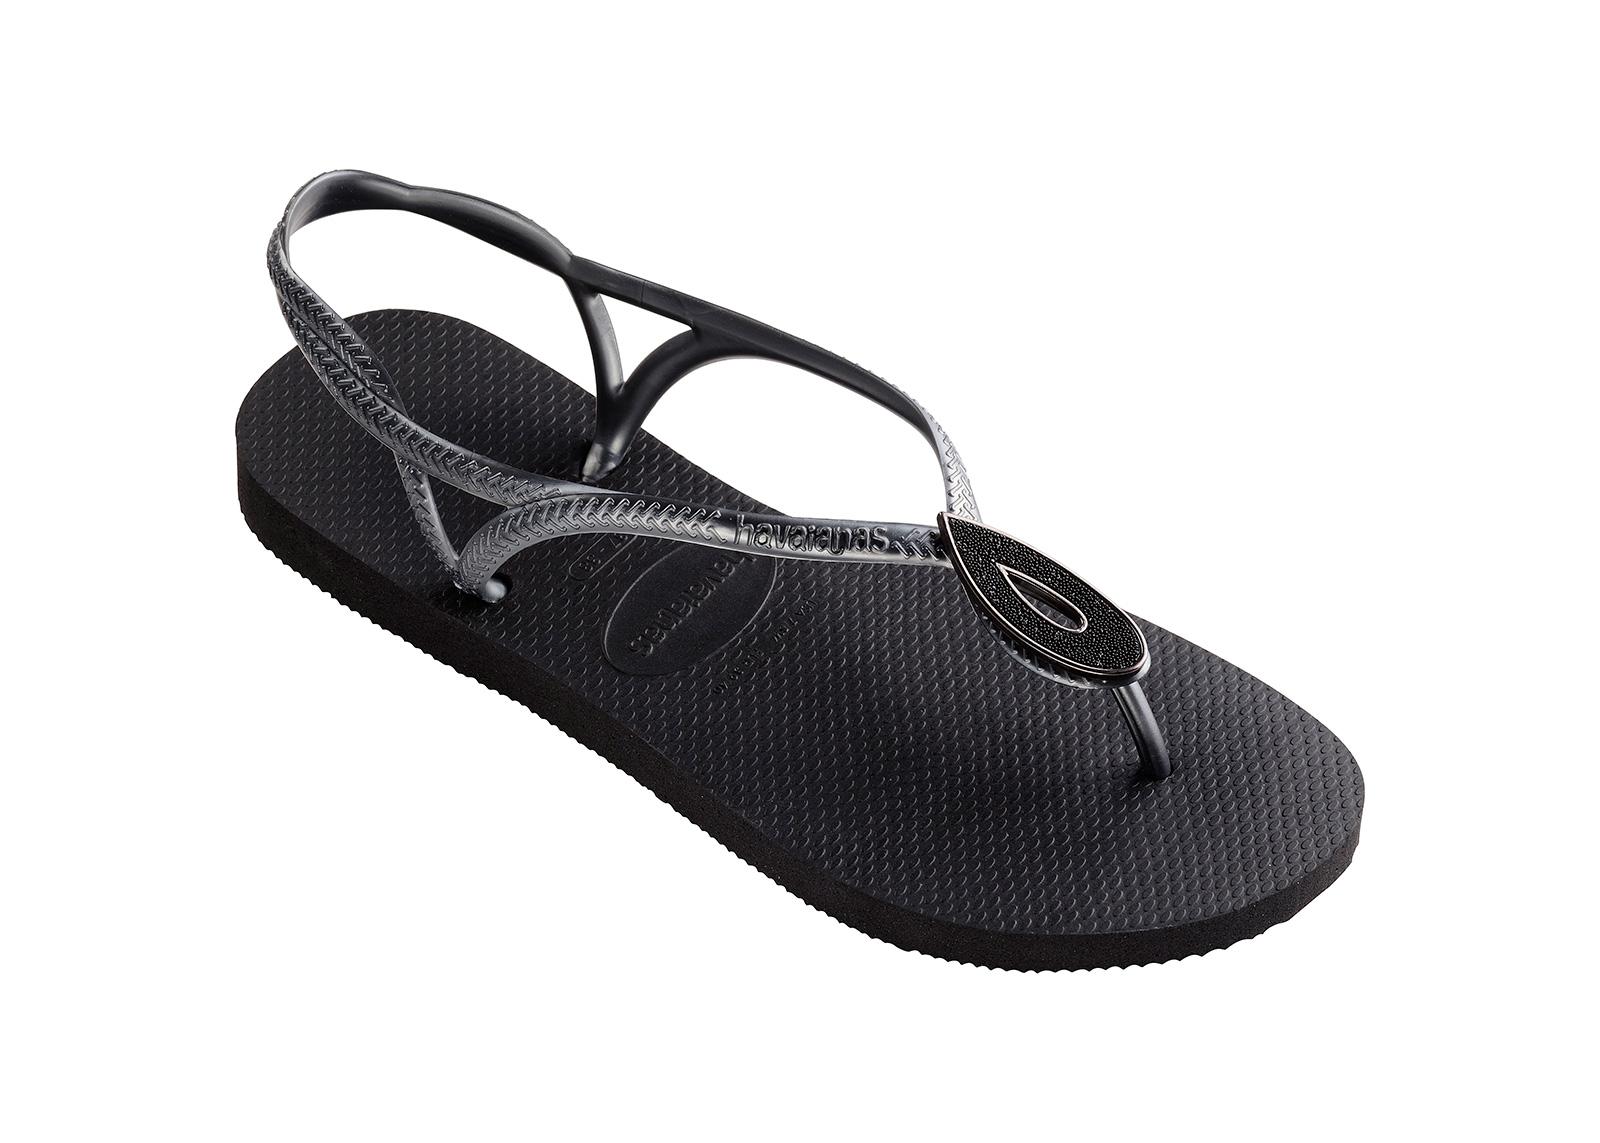 64ab57370f7c26 Sandals Black Flip Flops - Havaianas Luna Special Black